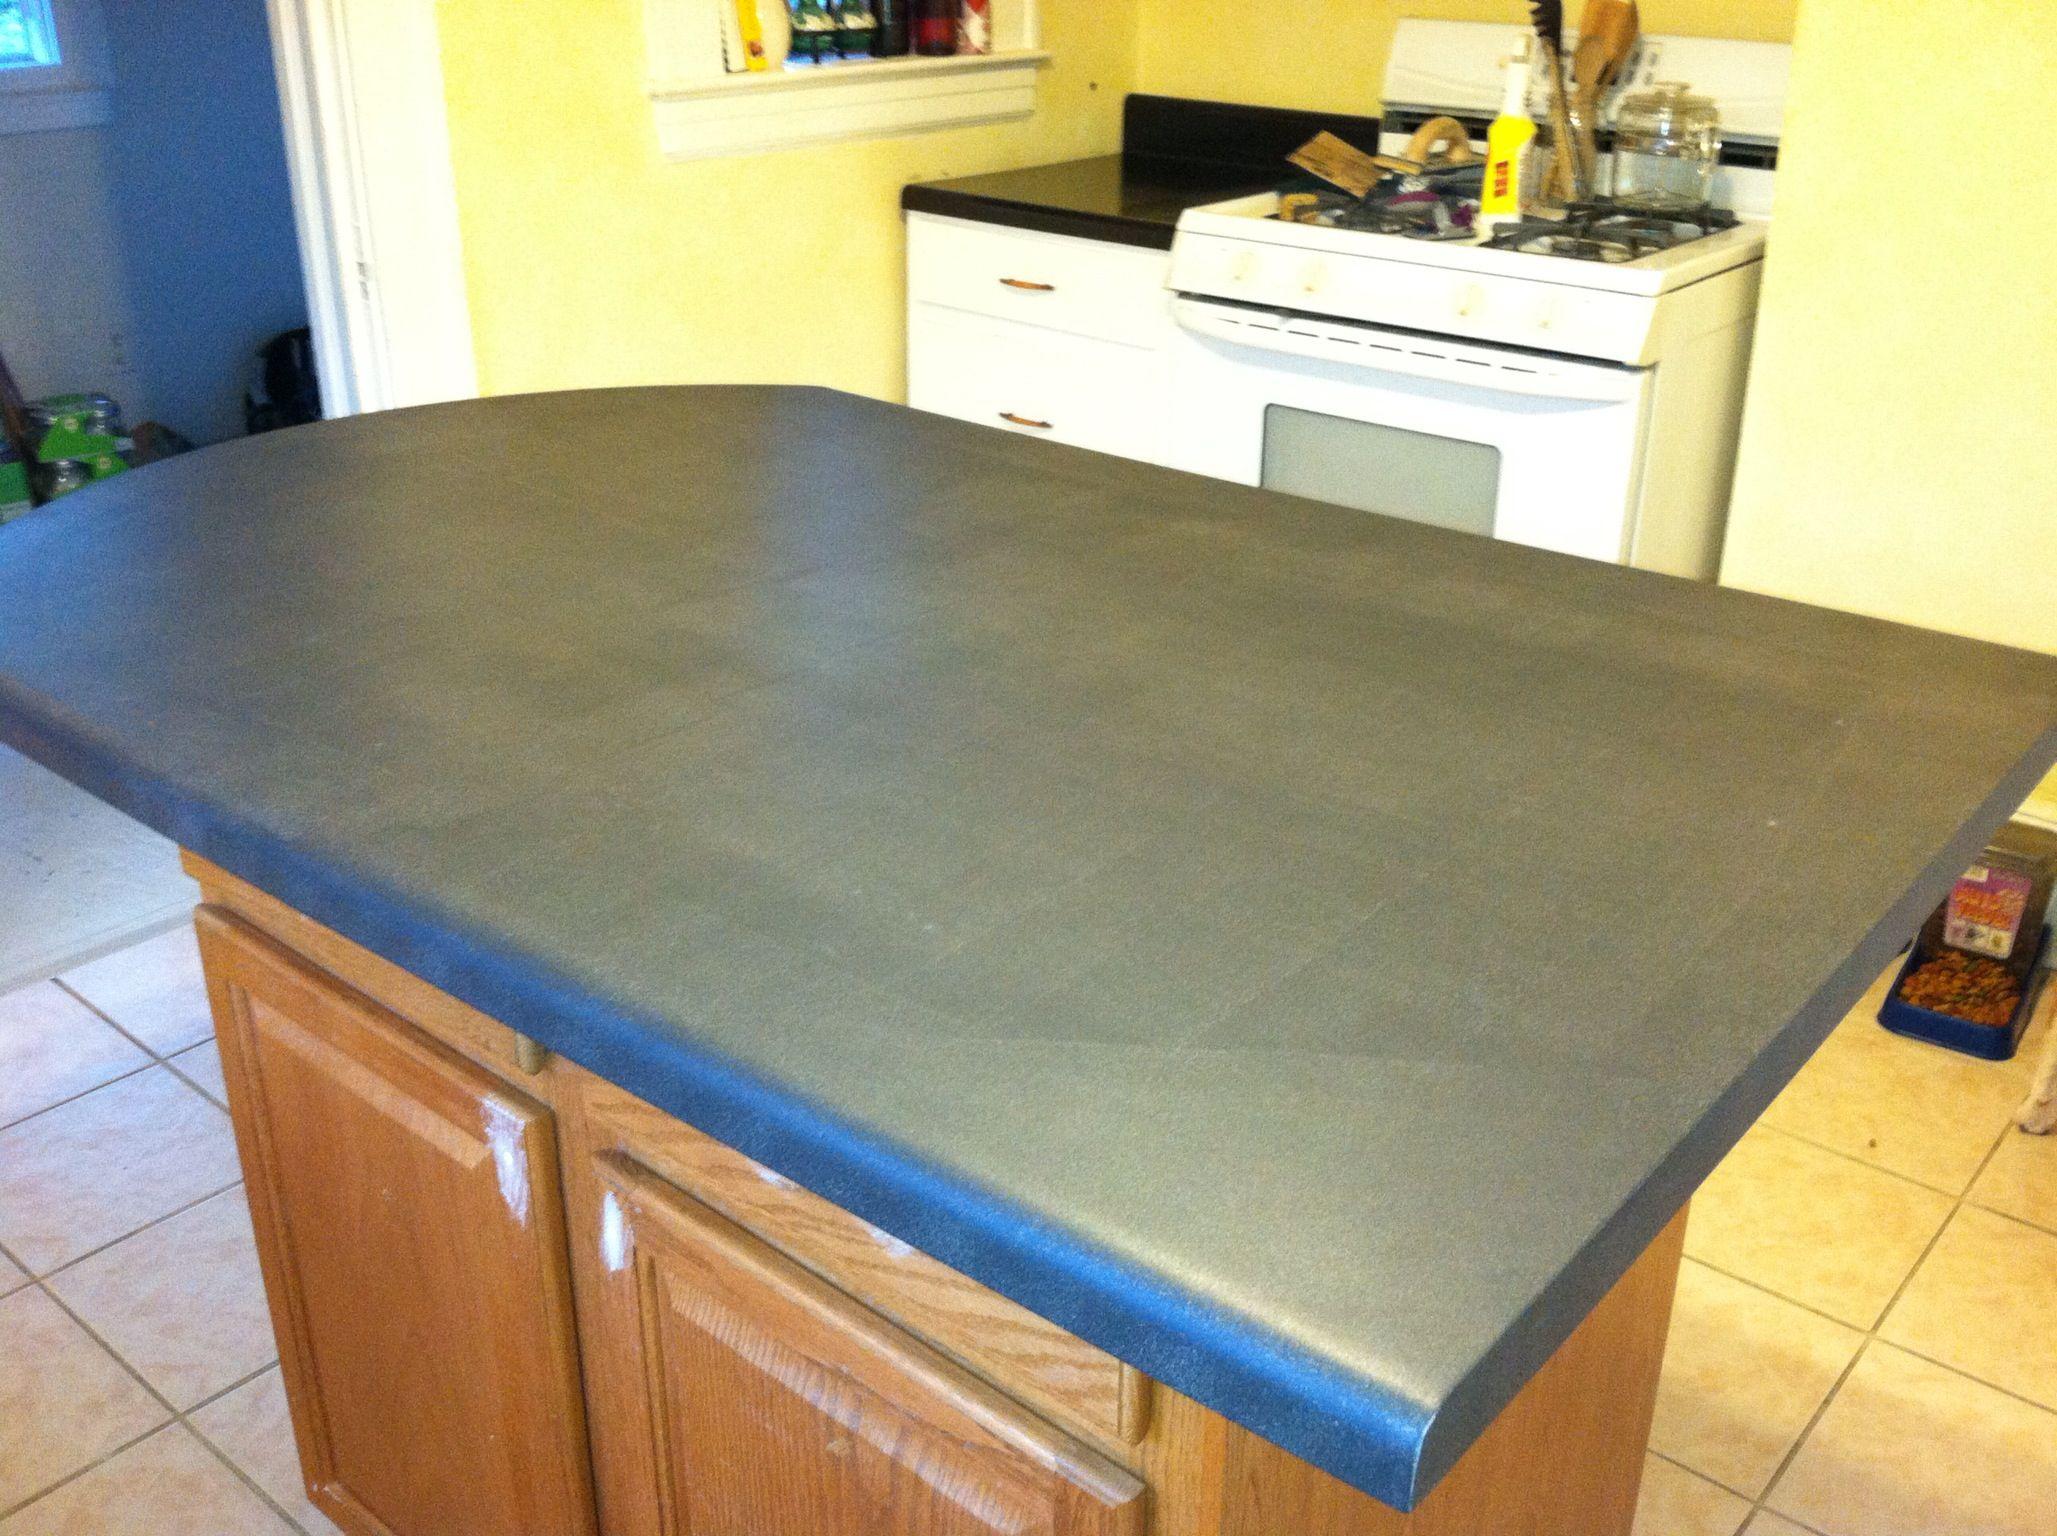 Chalk Paint Countertop First Coat repurposing Pinterest